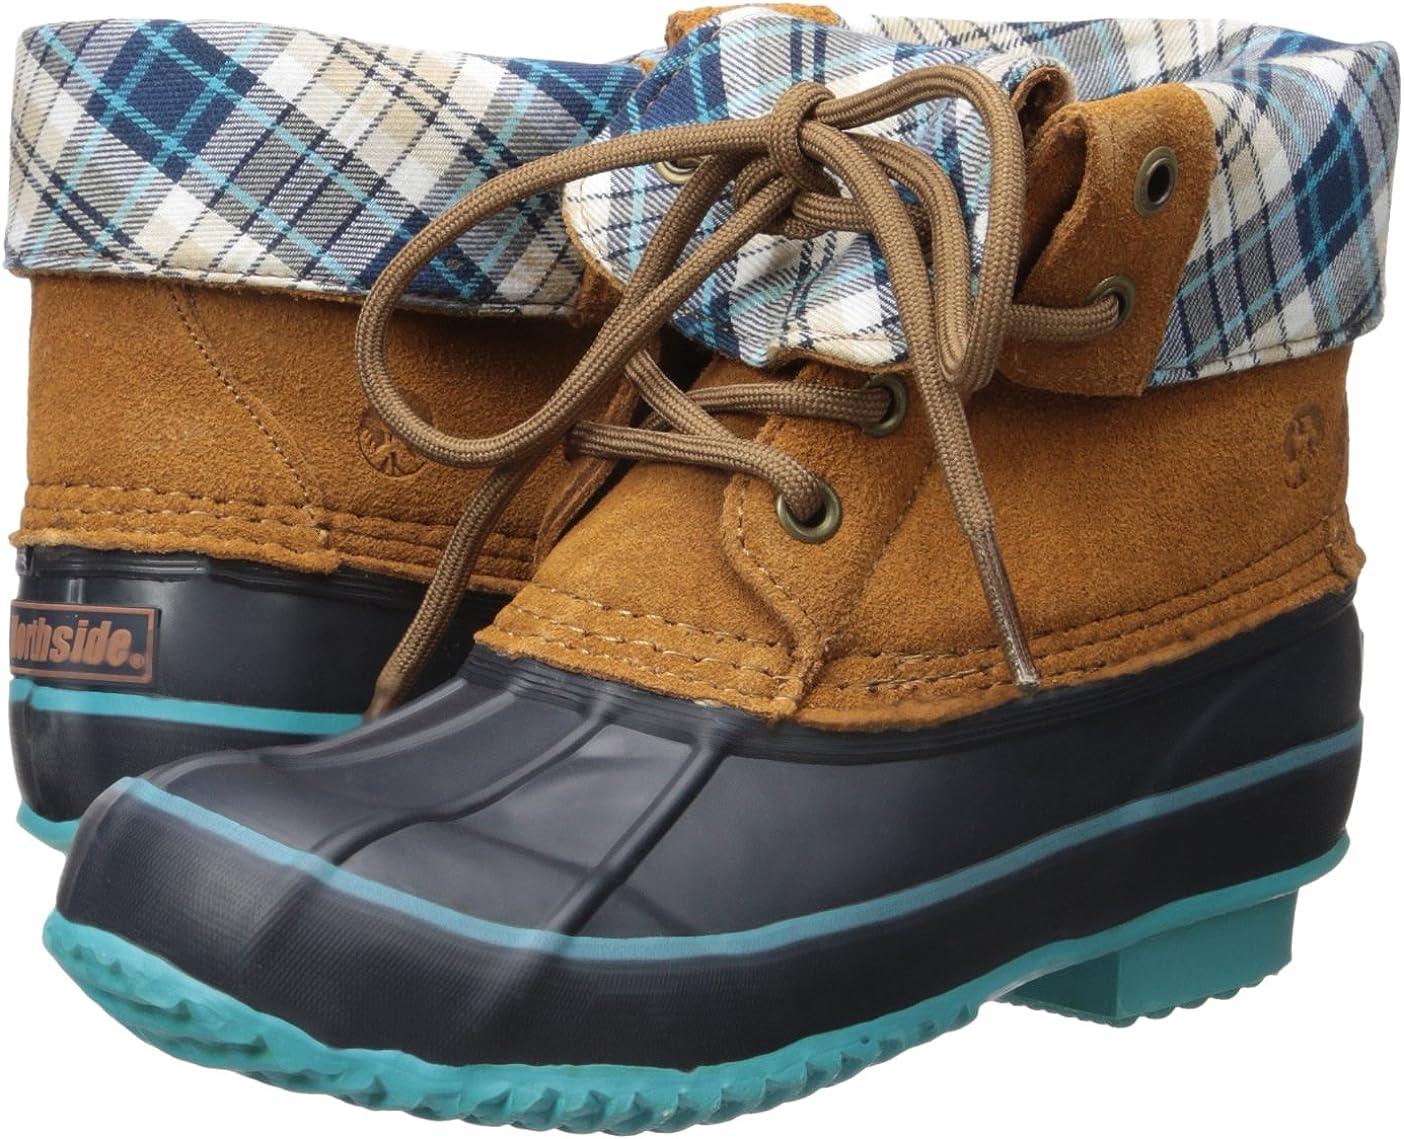 Northside Carrington Girls Waterproof Lace-up Duck Boot